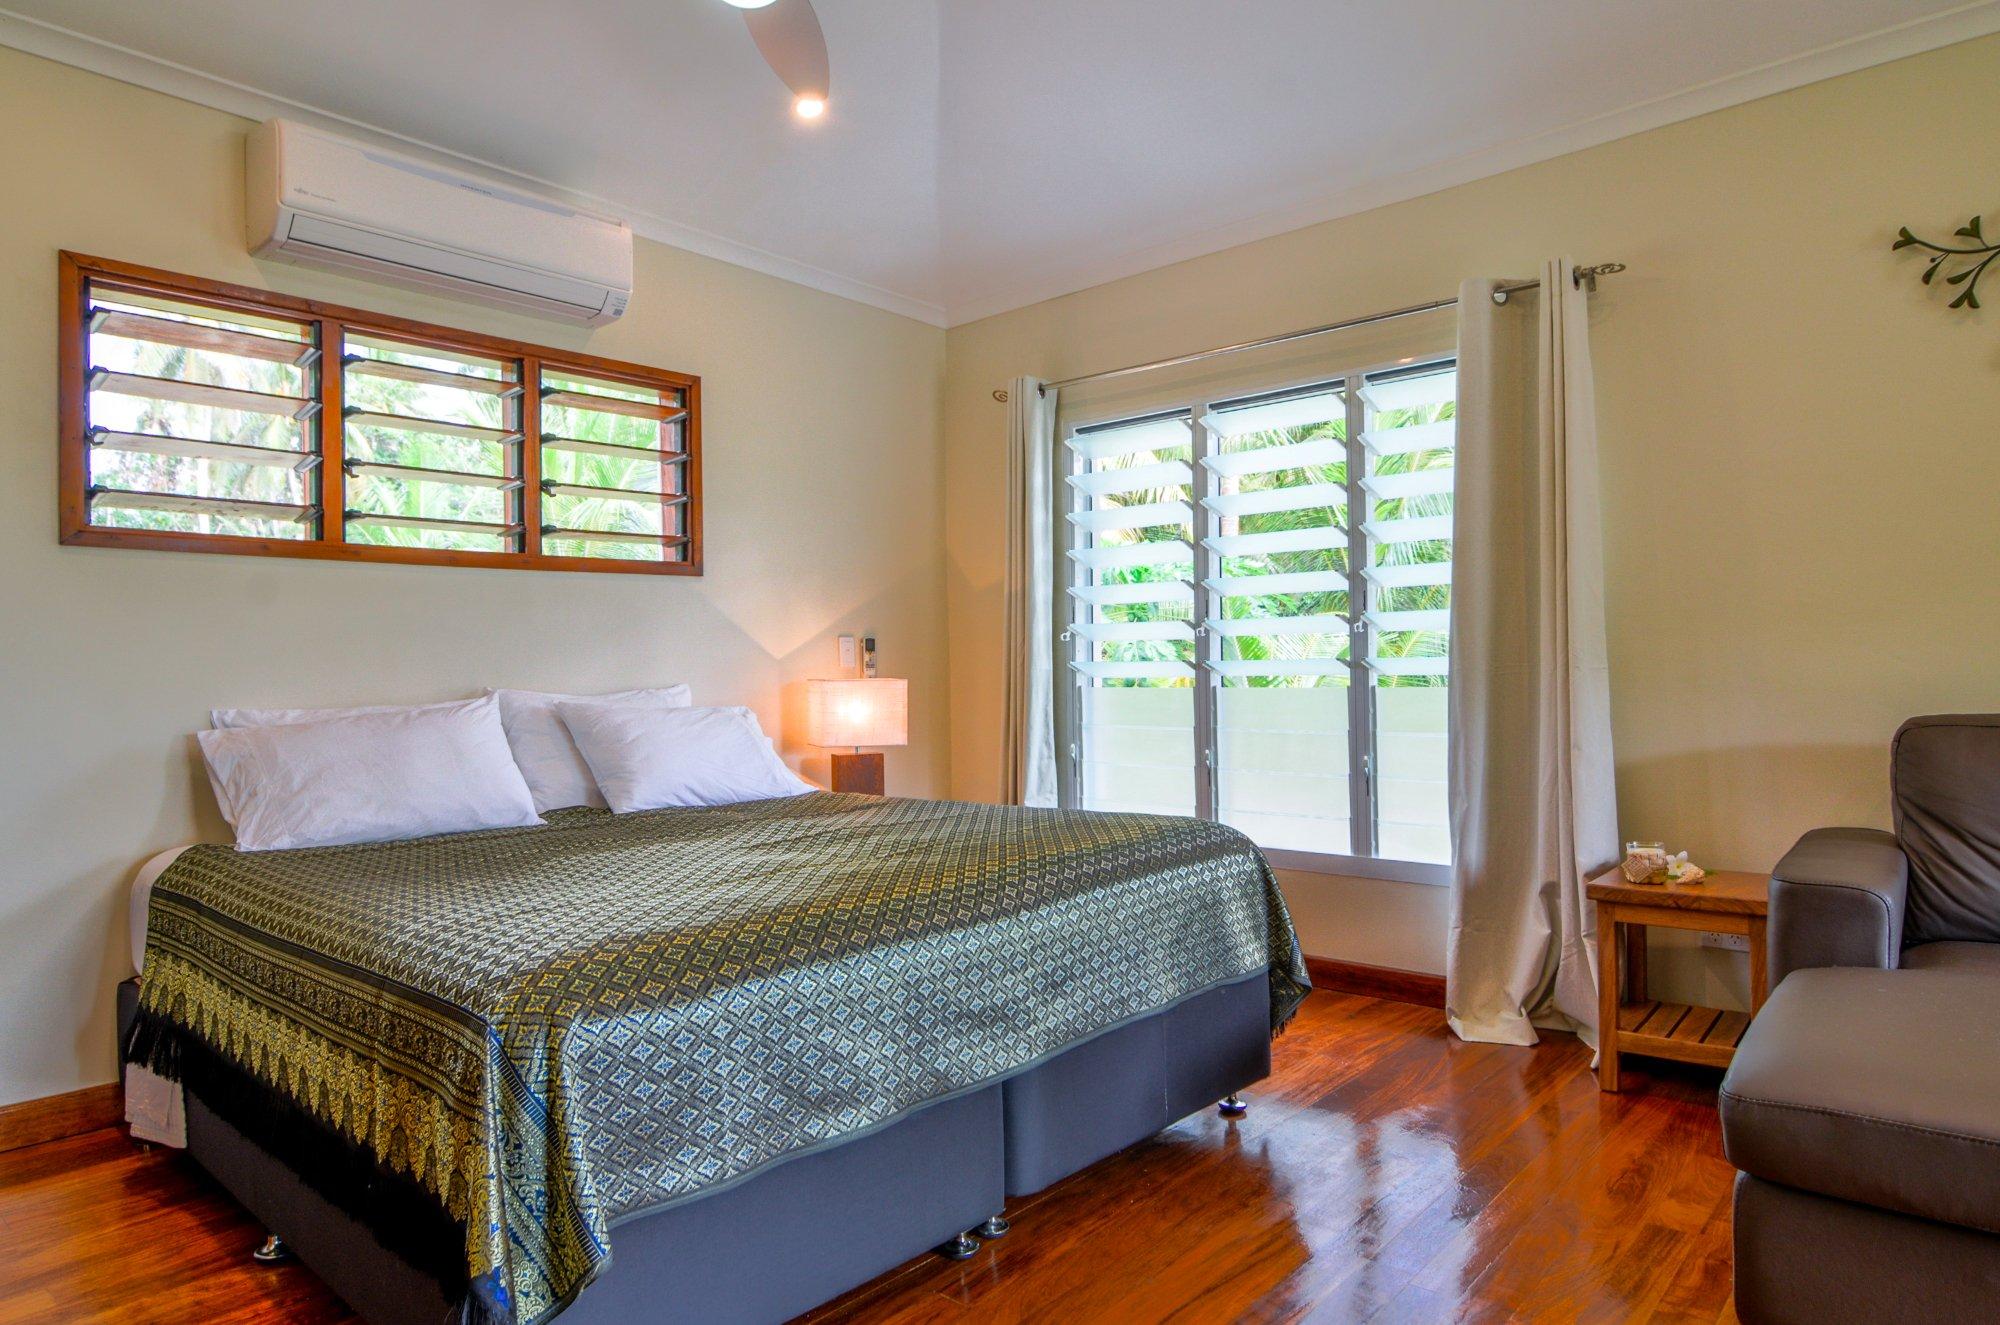 Vanuatu Yoga + Wellness Retreat - June / July